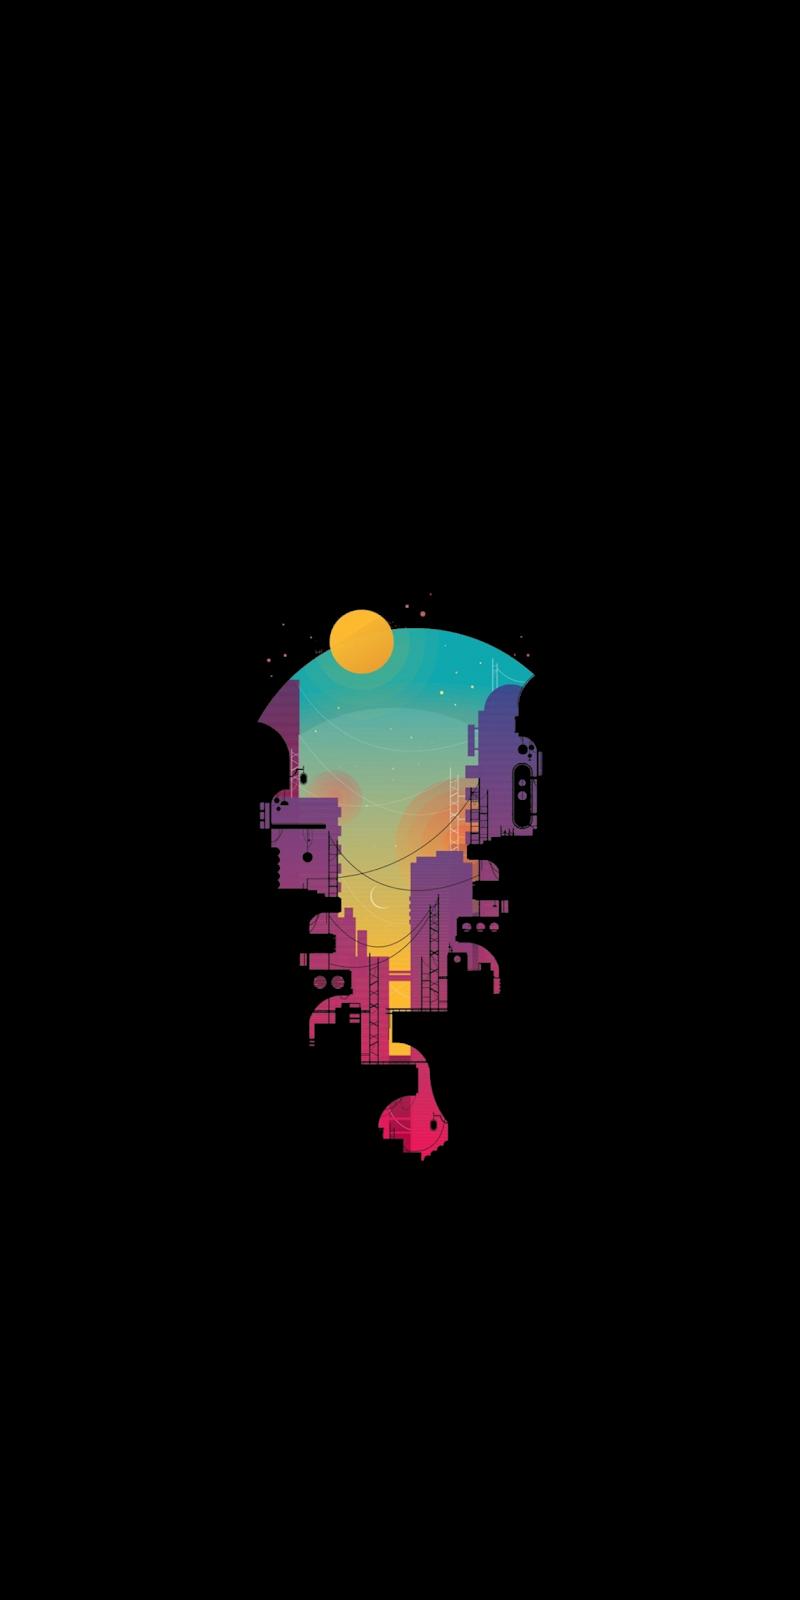 Minimalist City